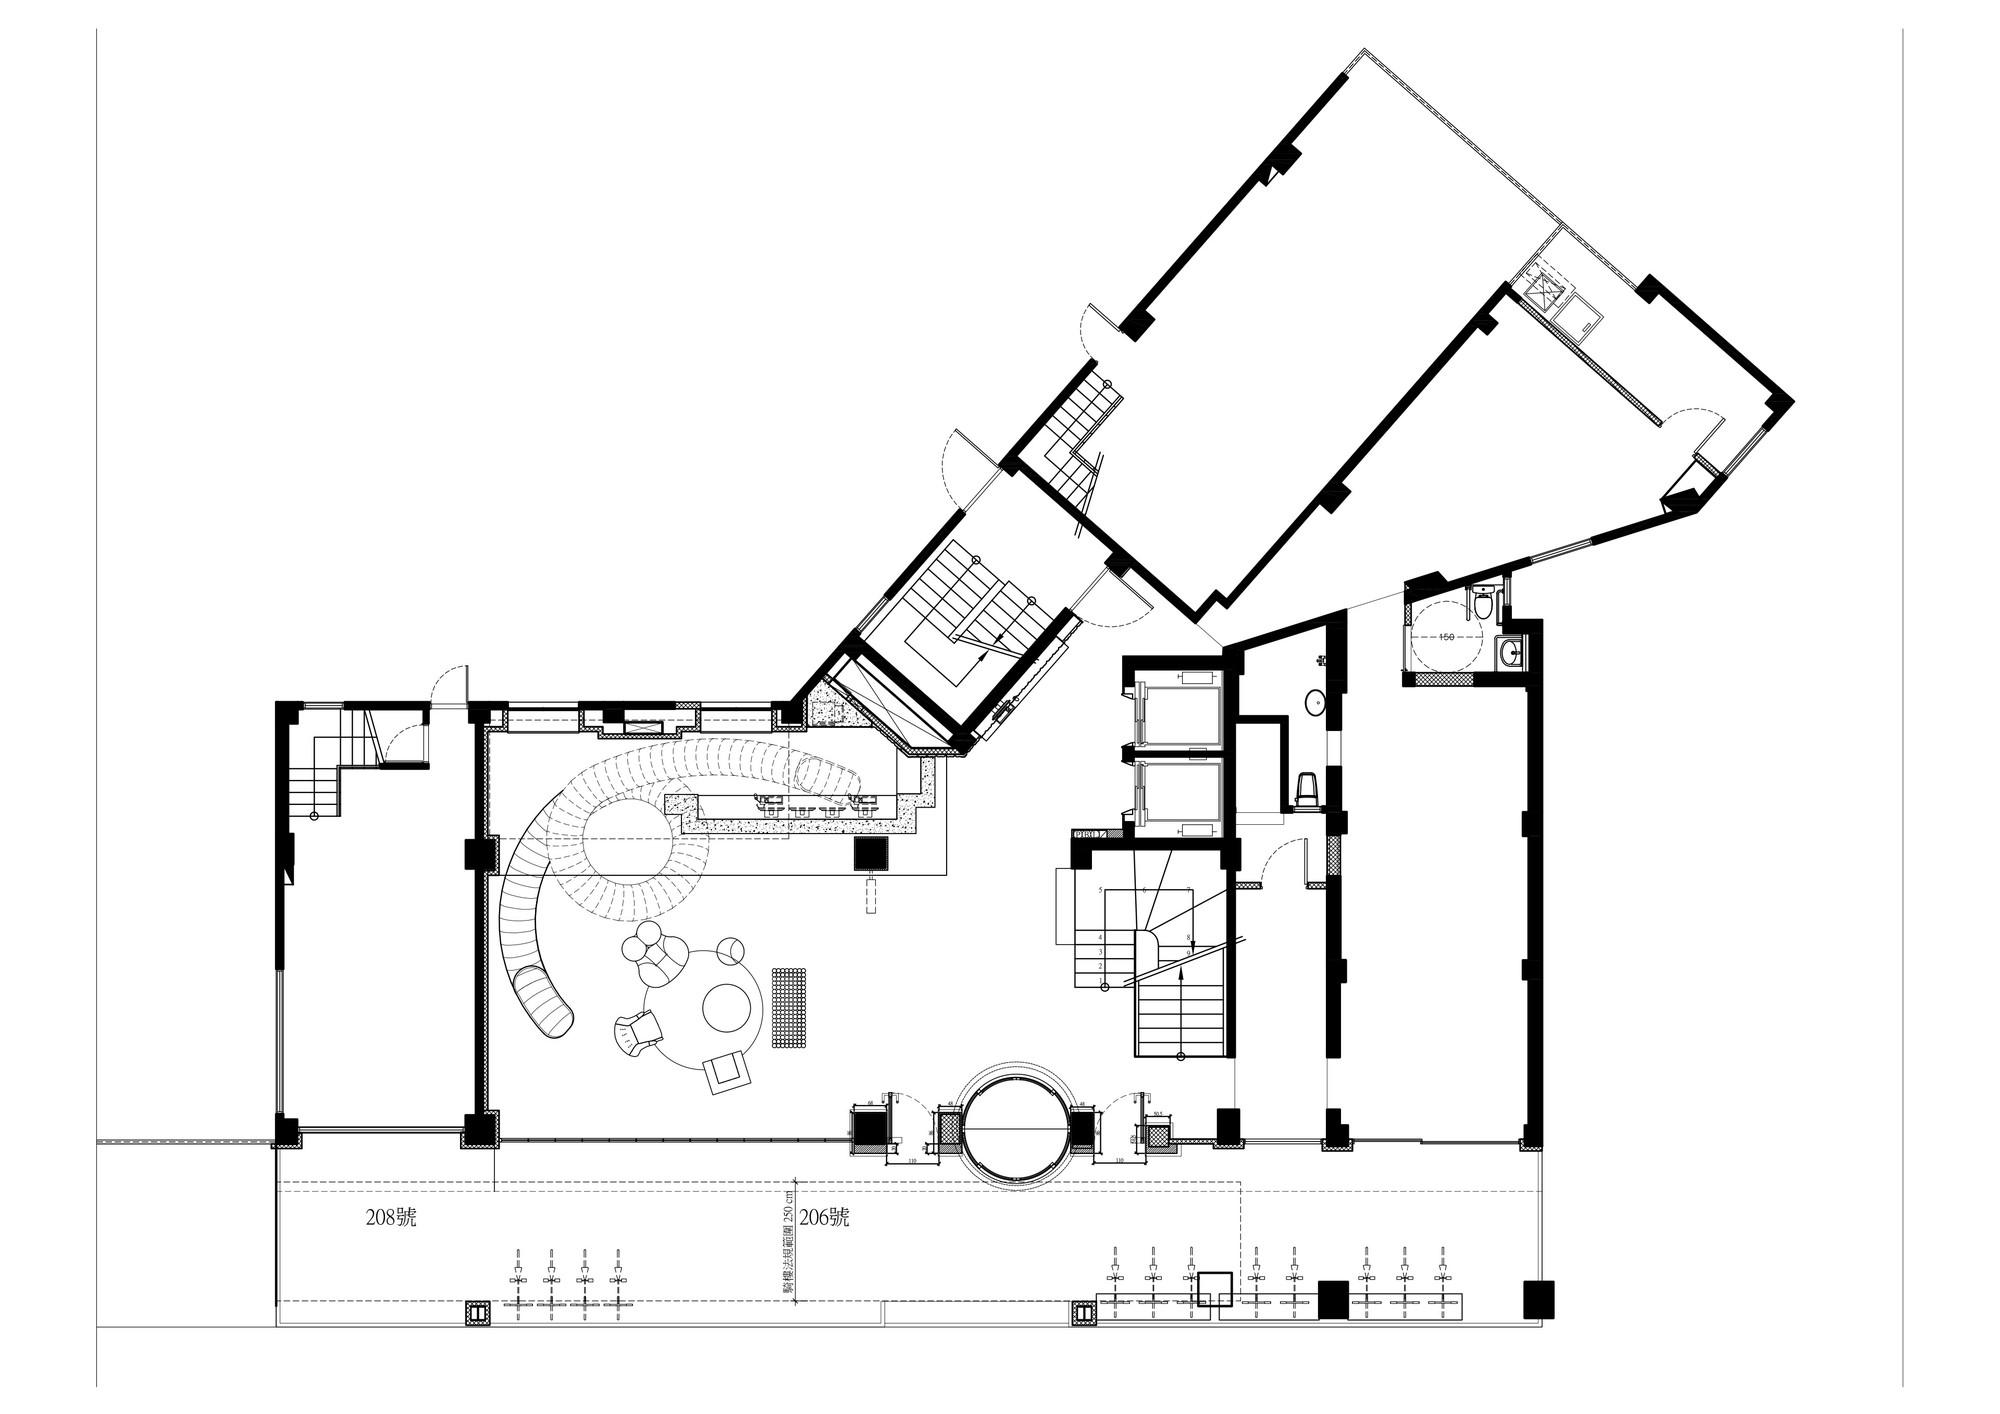 Hotel lobby floor plan - Floor Plan